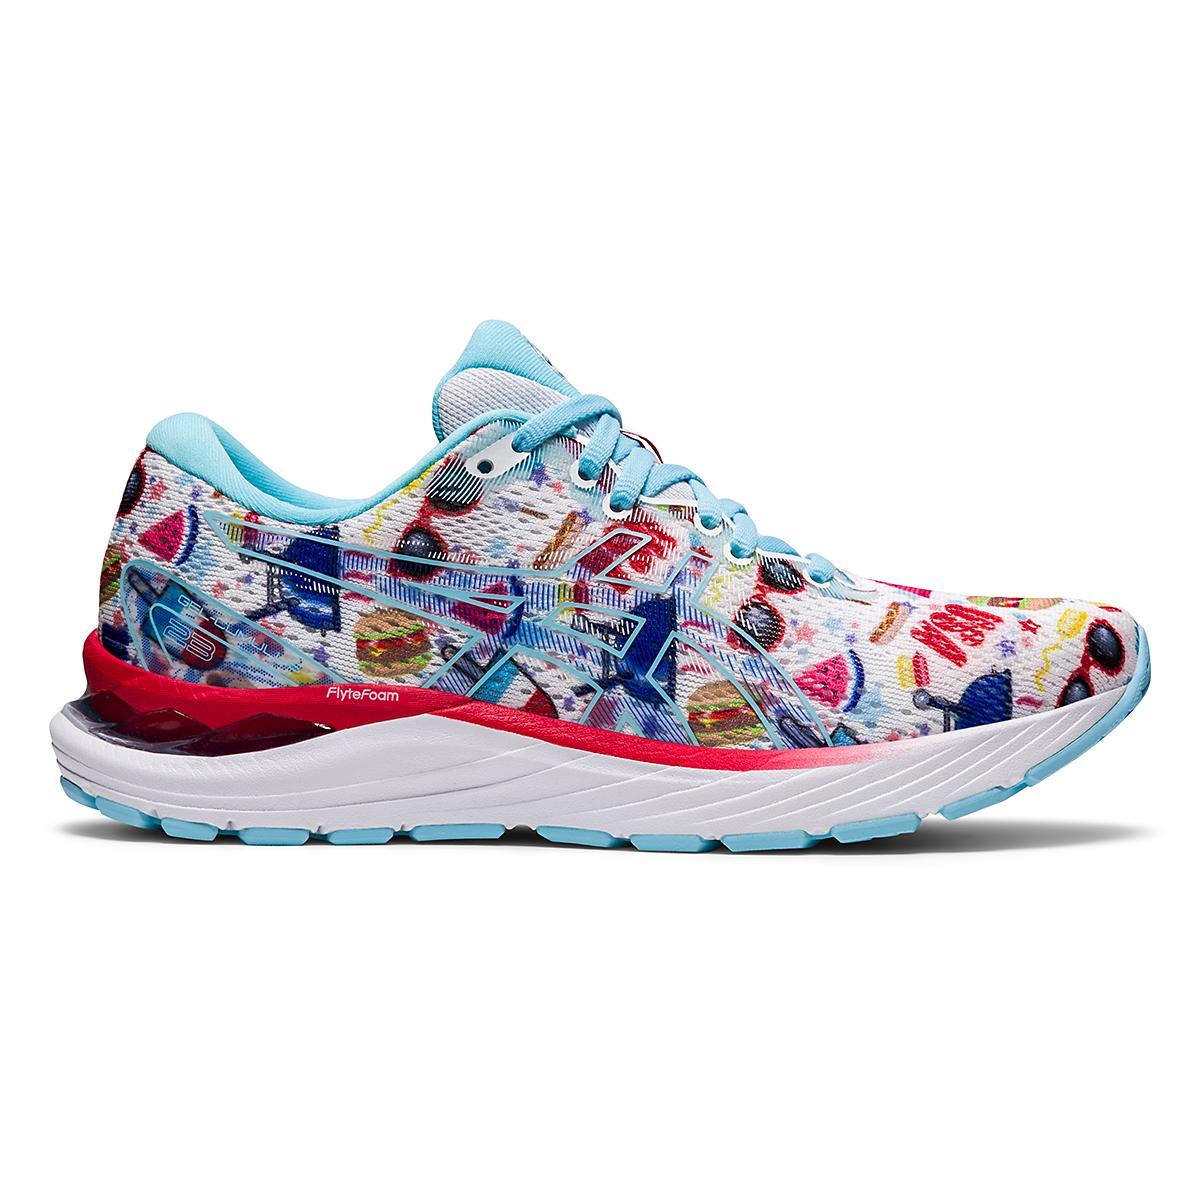 Women's Asics Gel-Cumulus 23 Cookout Running Shoe - Color: White/Asics Blue - Size: 5 - Width: Regular, White/Asics Blue, large, image 1